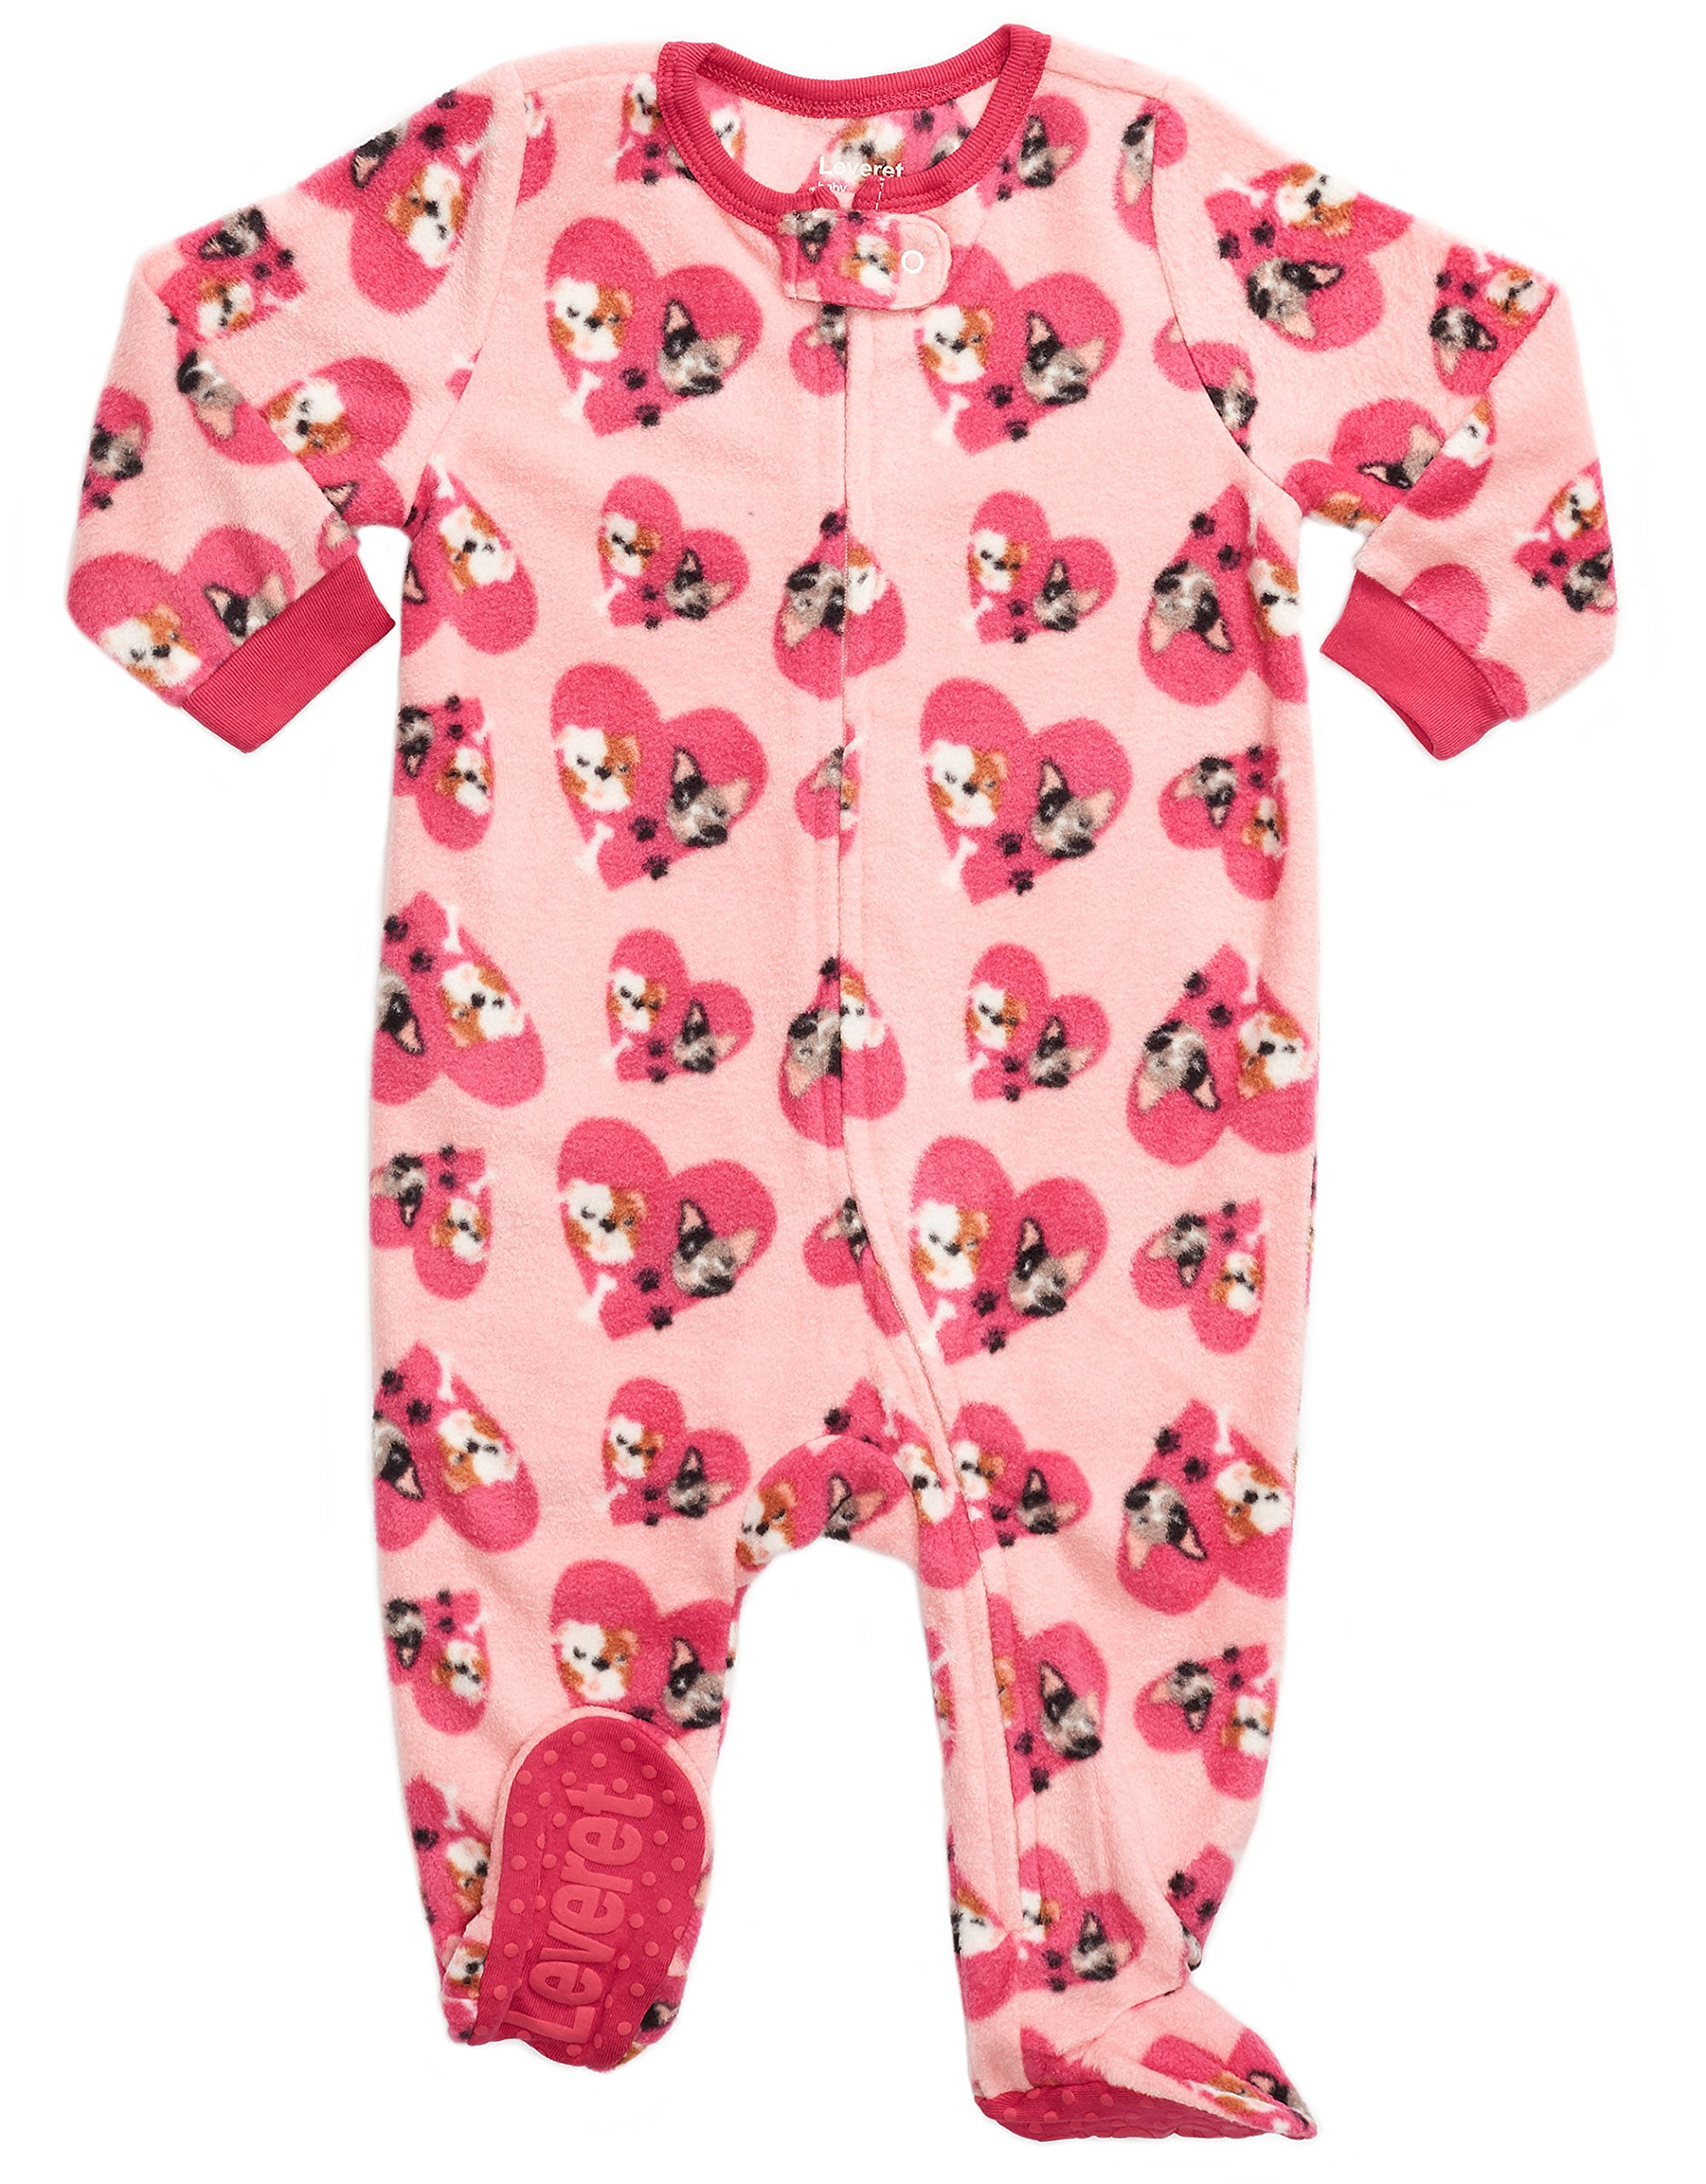 2d23d264cc Leveret Fleece Baby Girls Footed Pajamas Sleeper Kids   Toddler Pajamas (3  Months-5